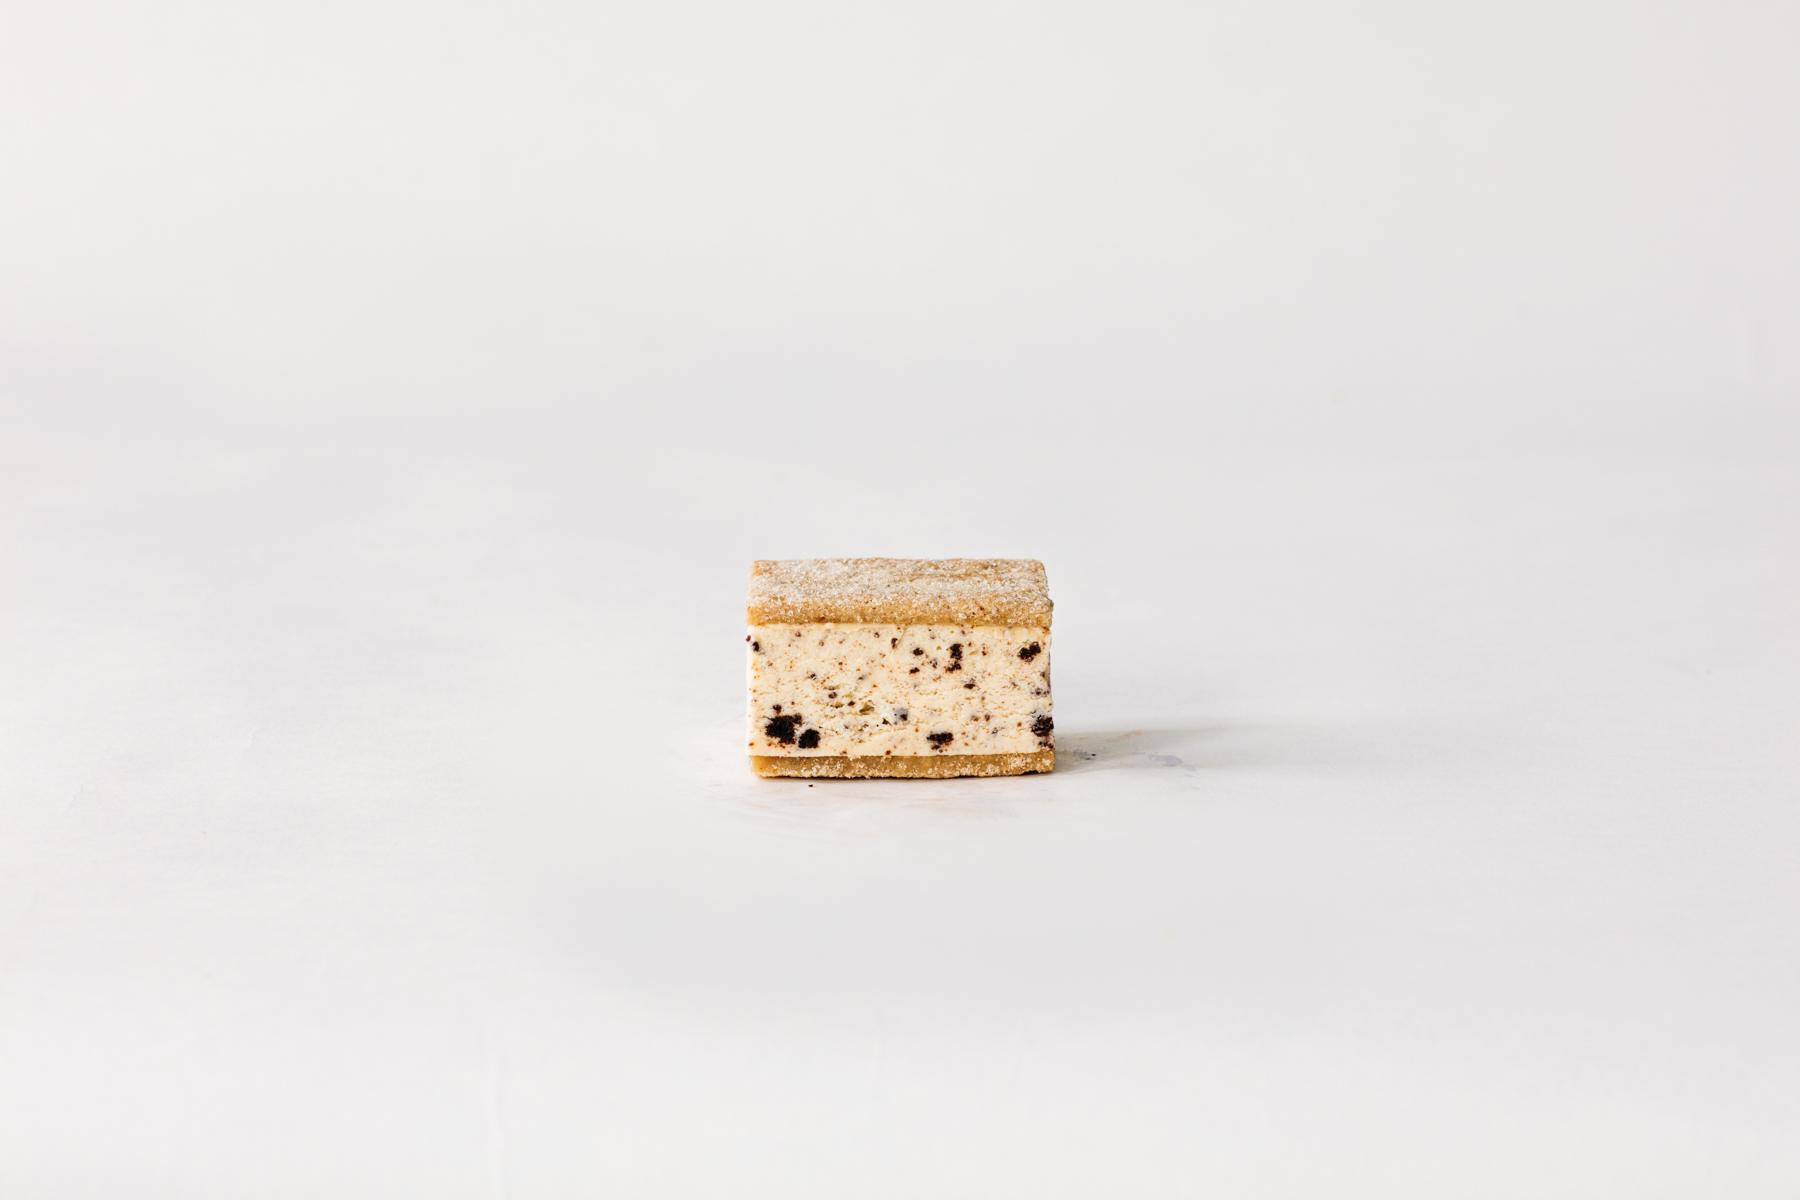 sandwich-brindle1.jpg